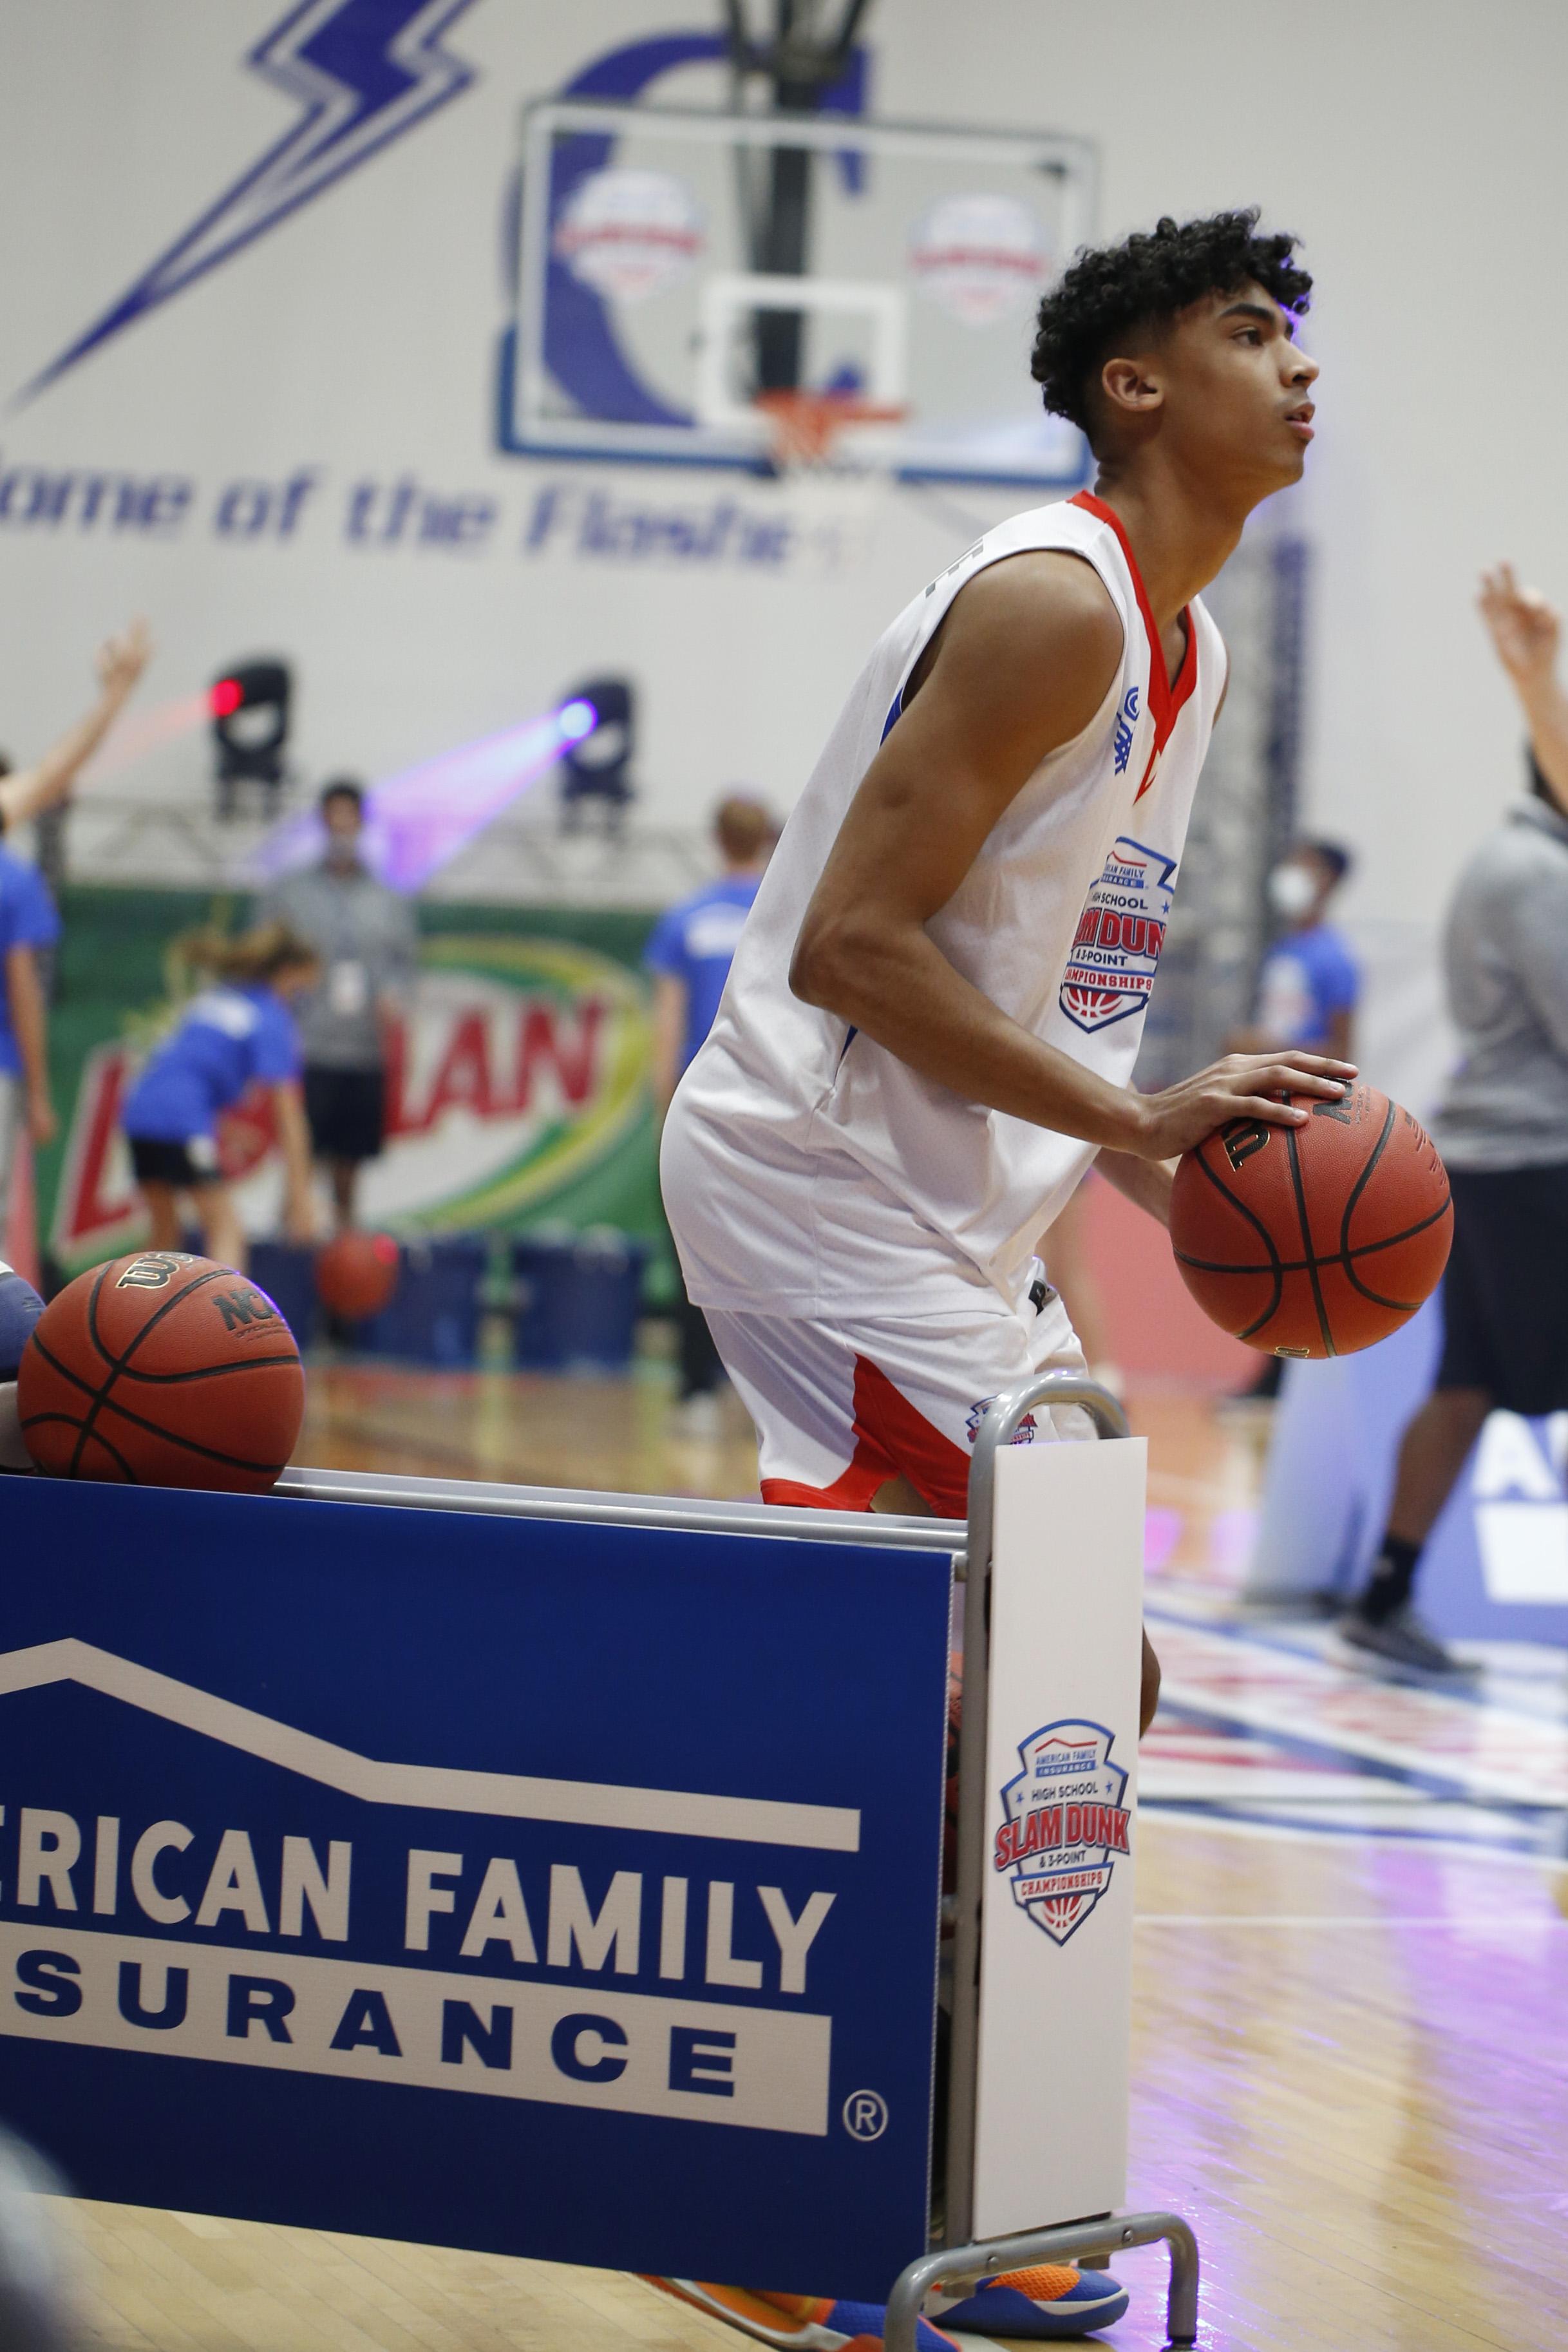 HIGH SCHOOL BASKETBALL: MAR 30 American Family Insurance High School Slam Dunk & 3 Point Championships